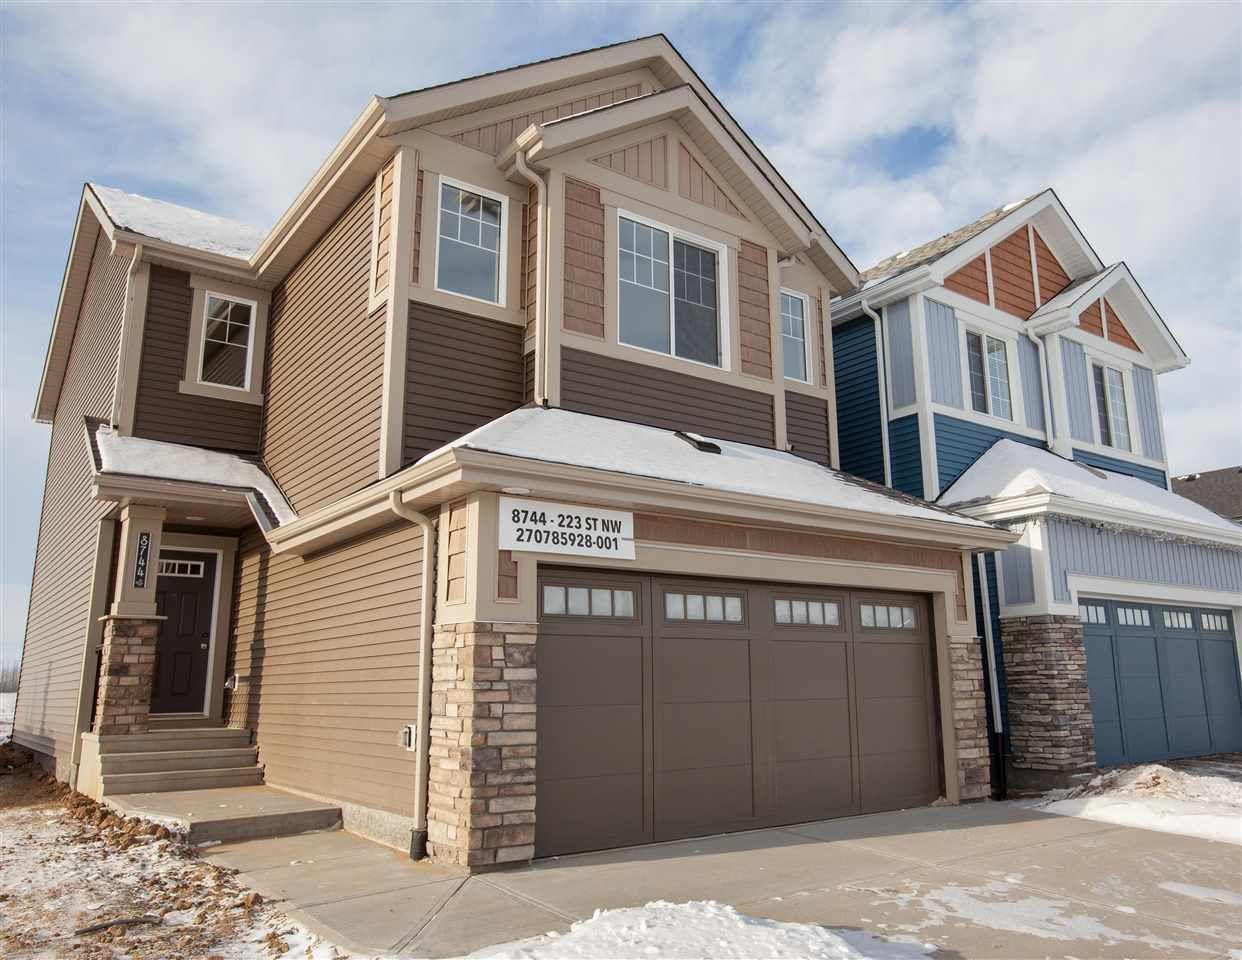 Main Photo: 8744 223 Street in Edmonton: Zone 58 House for sale : MLS®# E4140341